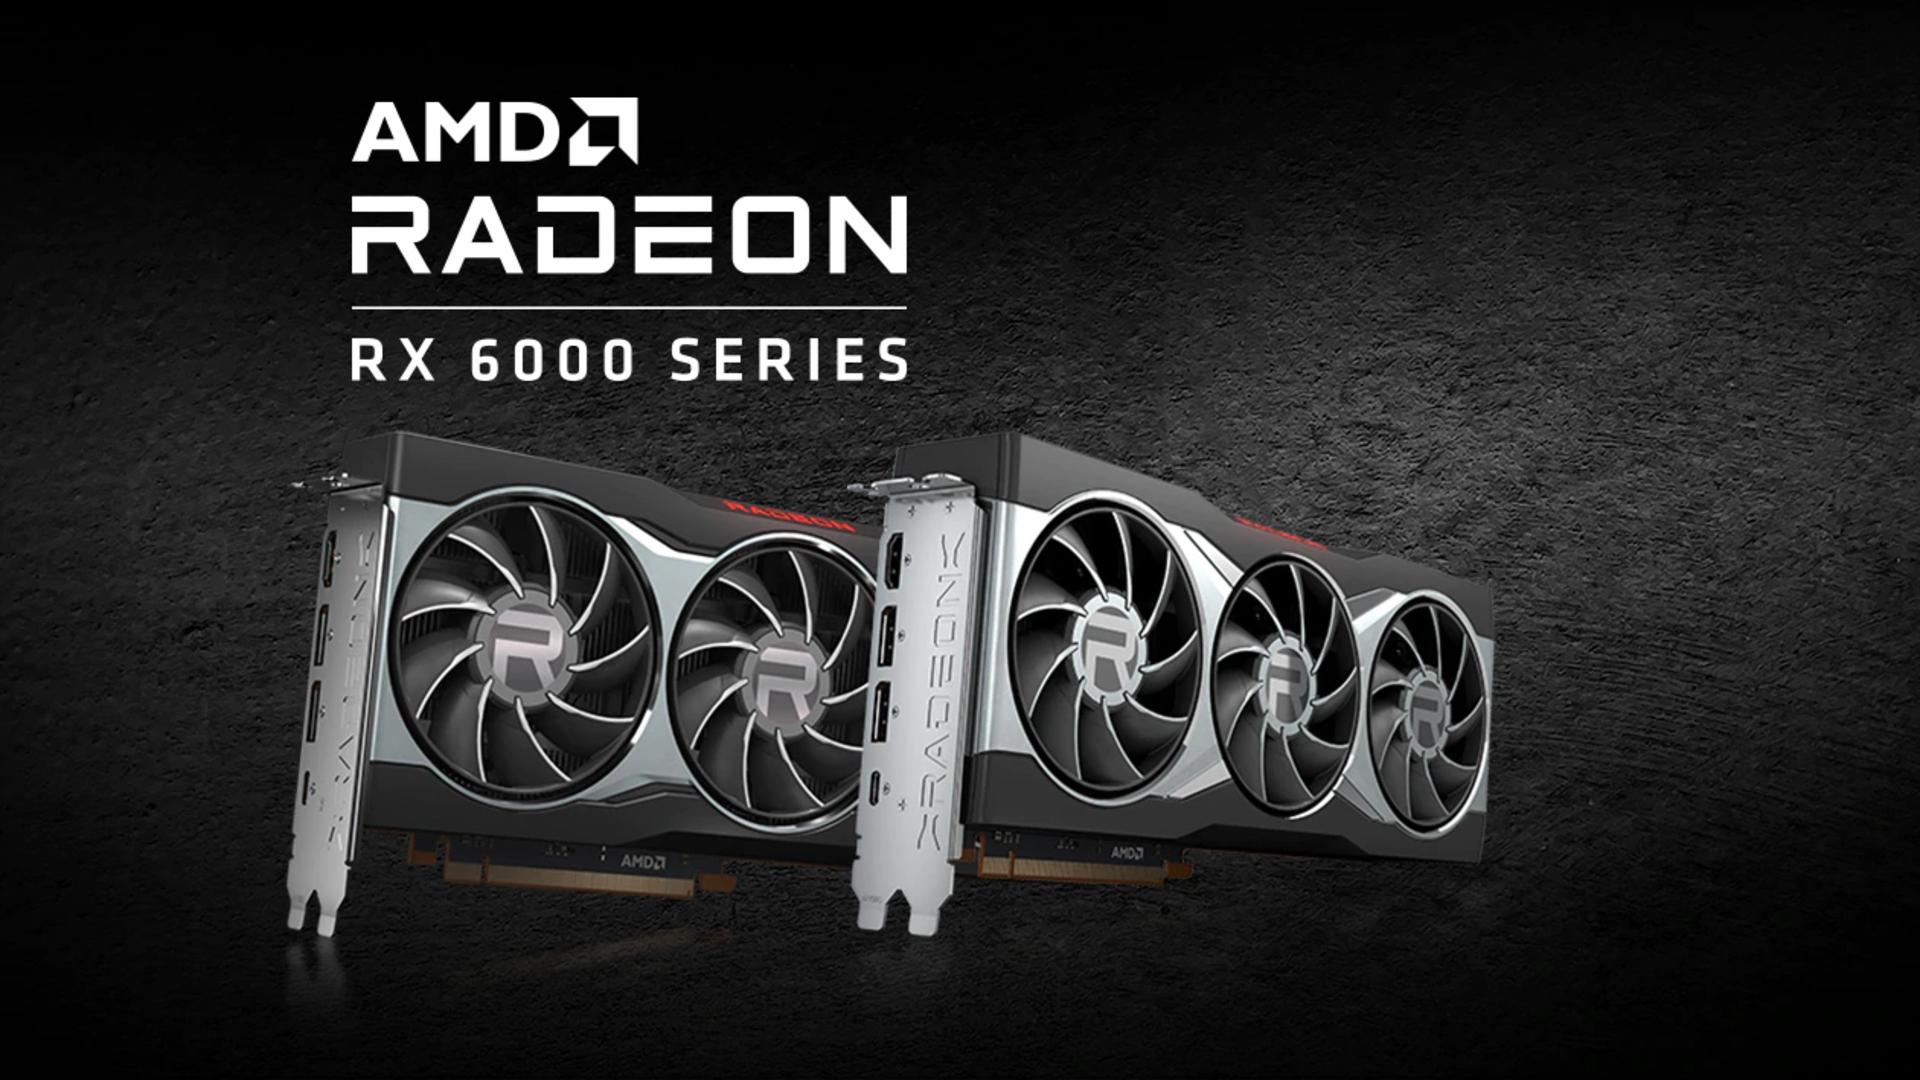 AMD Radeon RX 6000 series GPUs on grey background